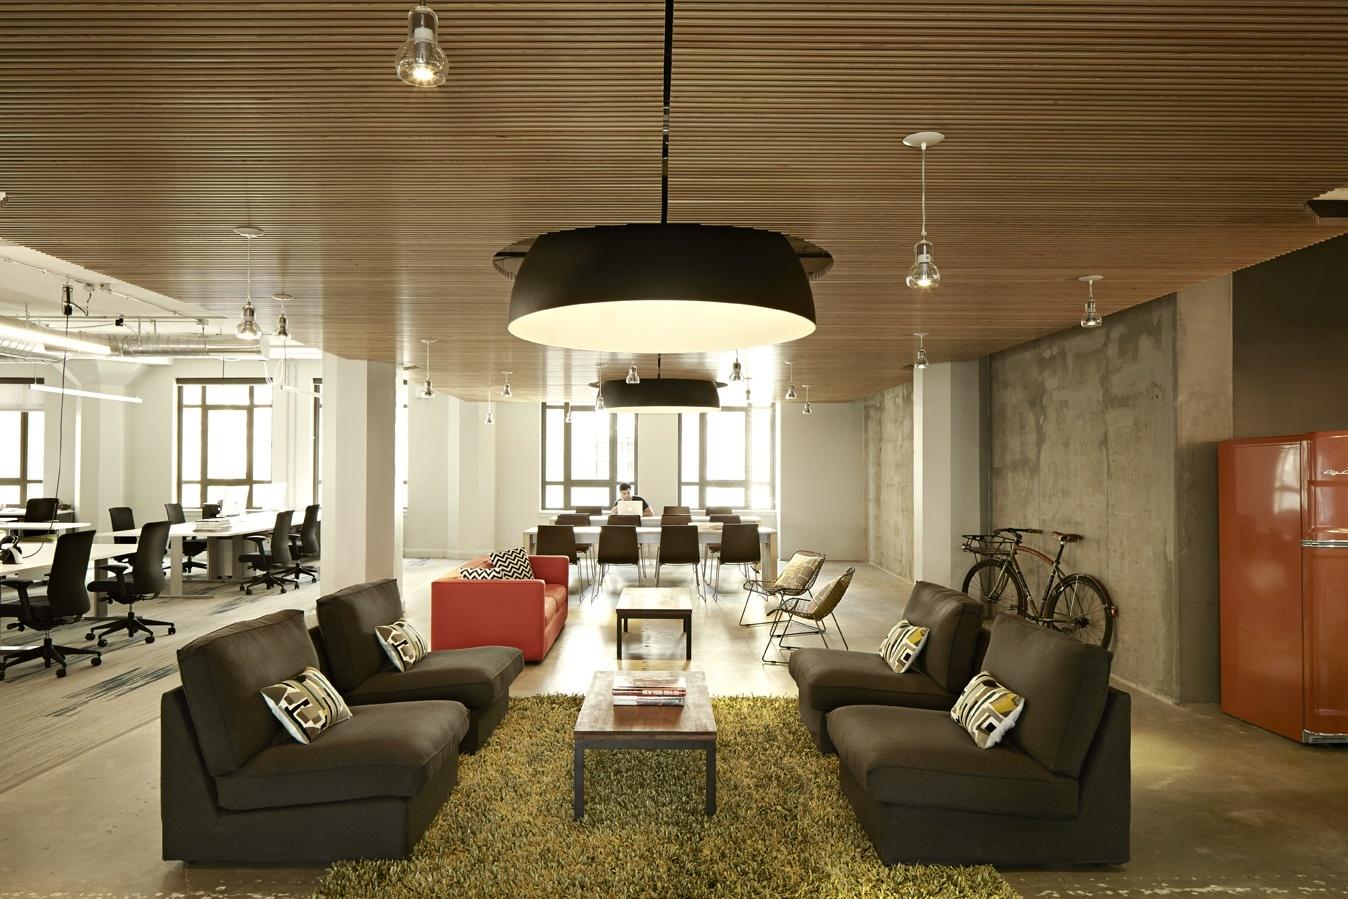 Runway startup incubator in soma officelovin 39 for Interior design startup